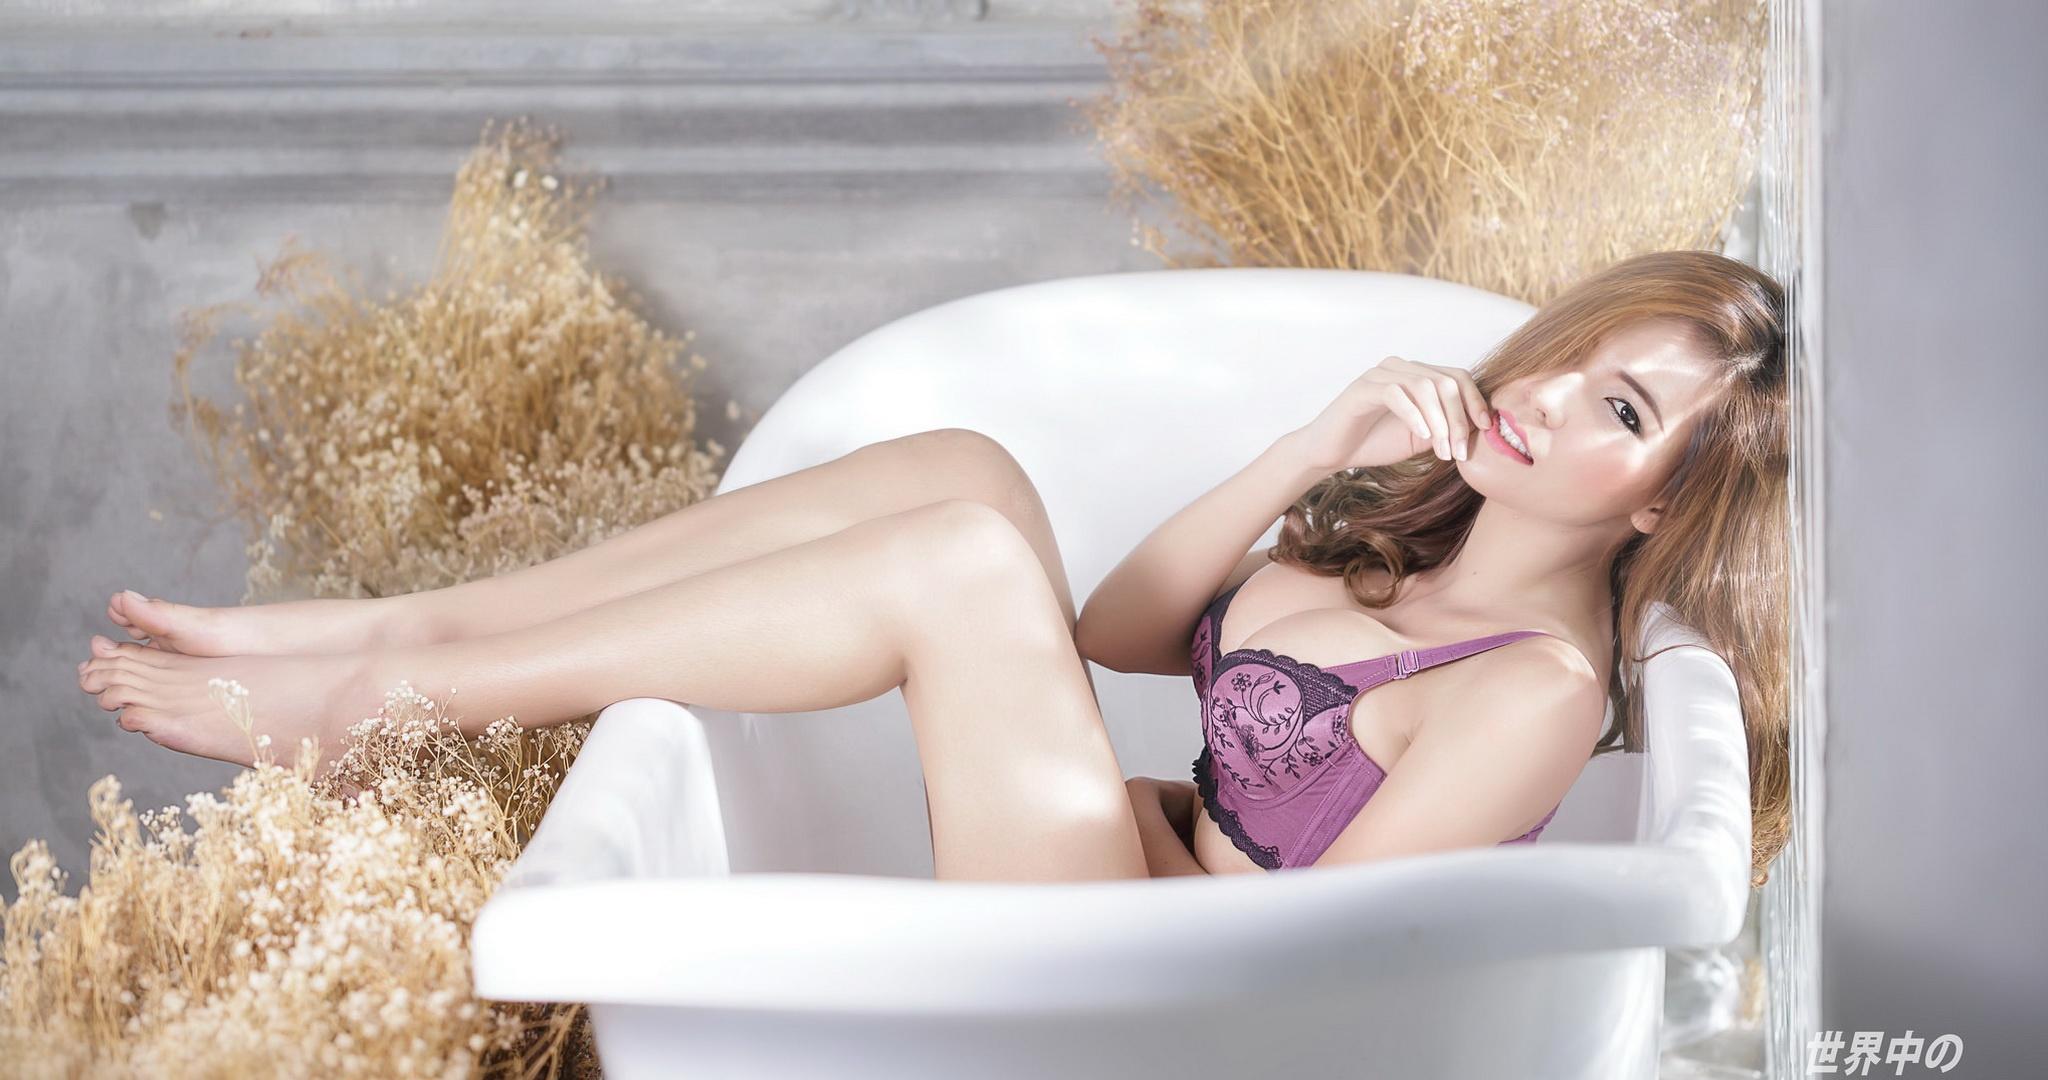 Marjana nude by the fireplace